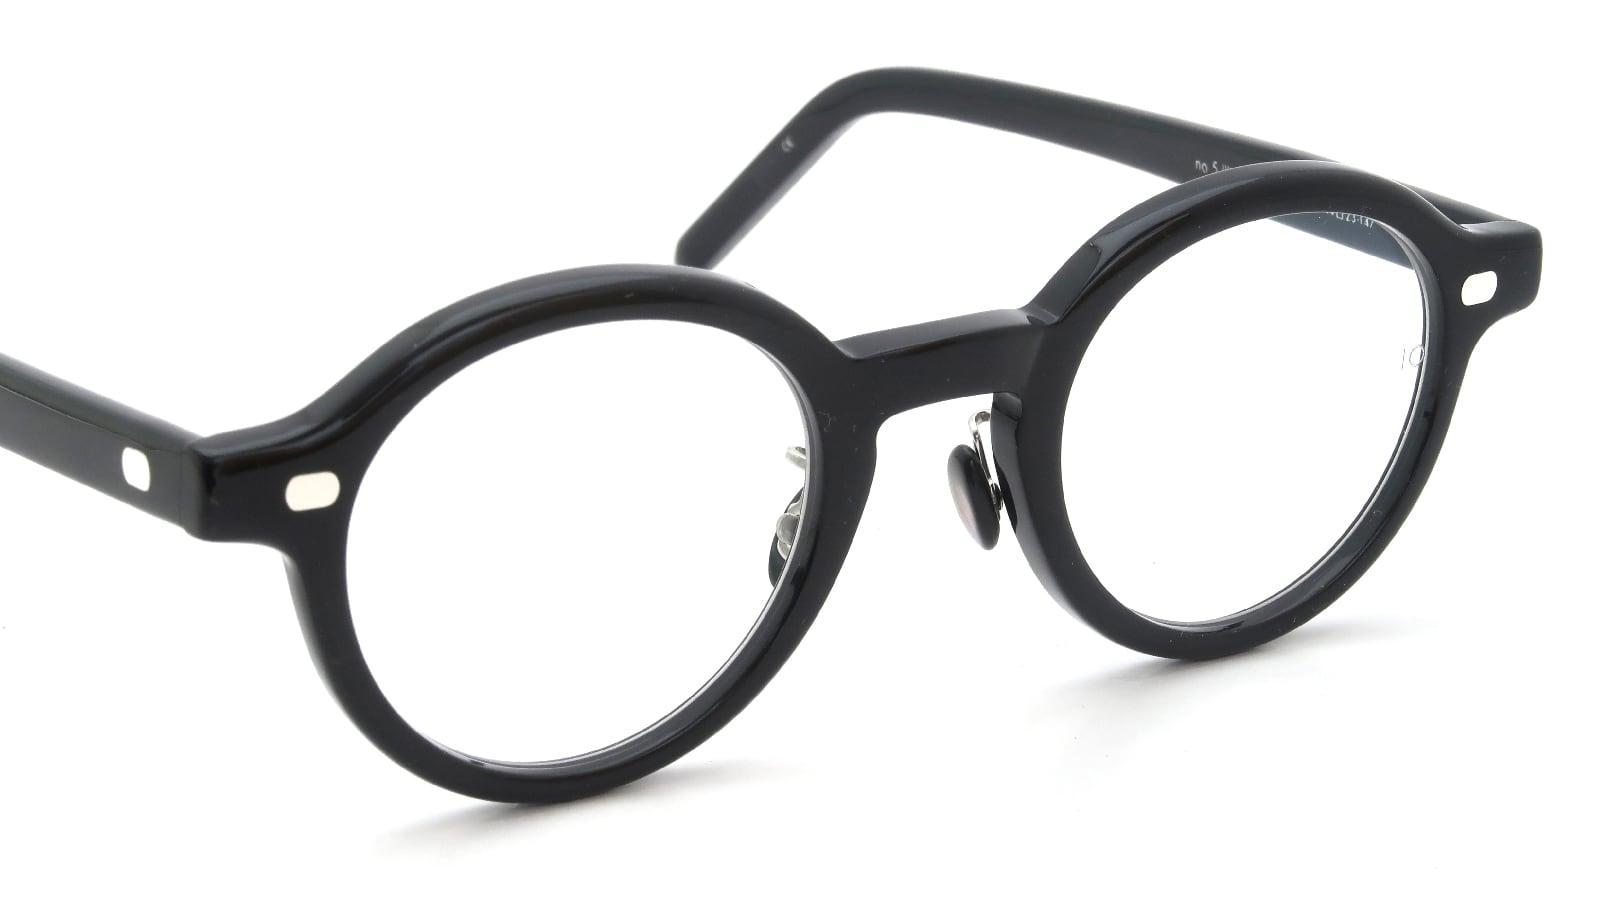 10 eyevan NO.5 Ⅲ FR 44size c.1002S Black 6